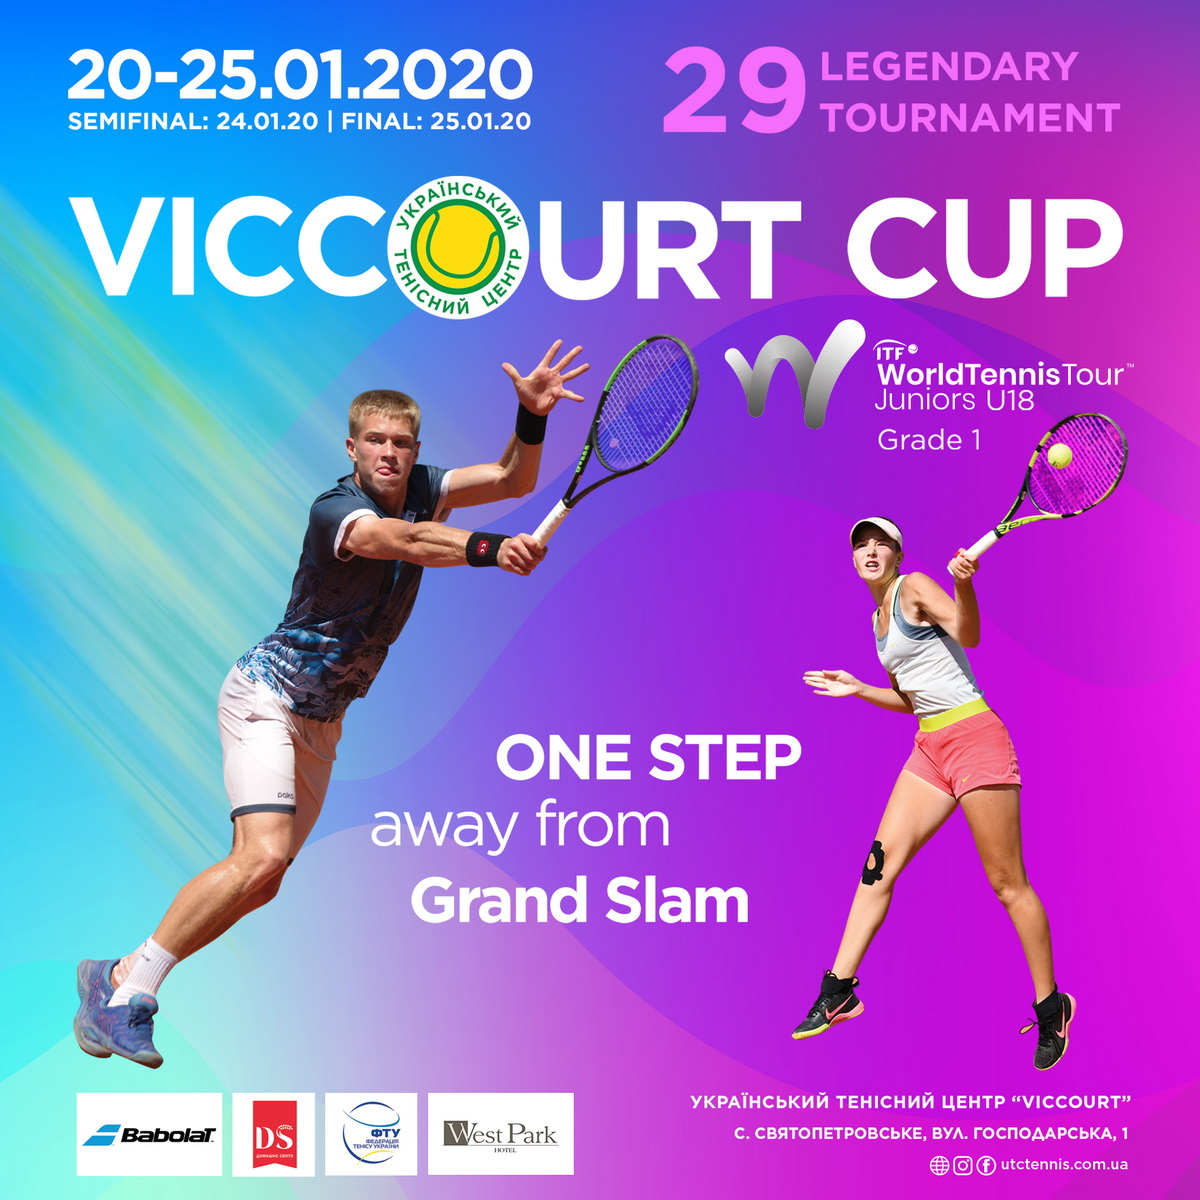 Viccourt cup. Пресс-релиз